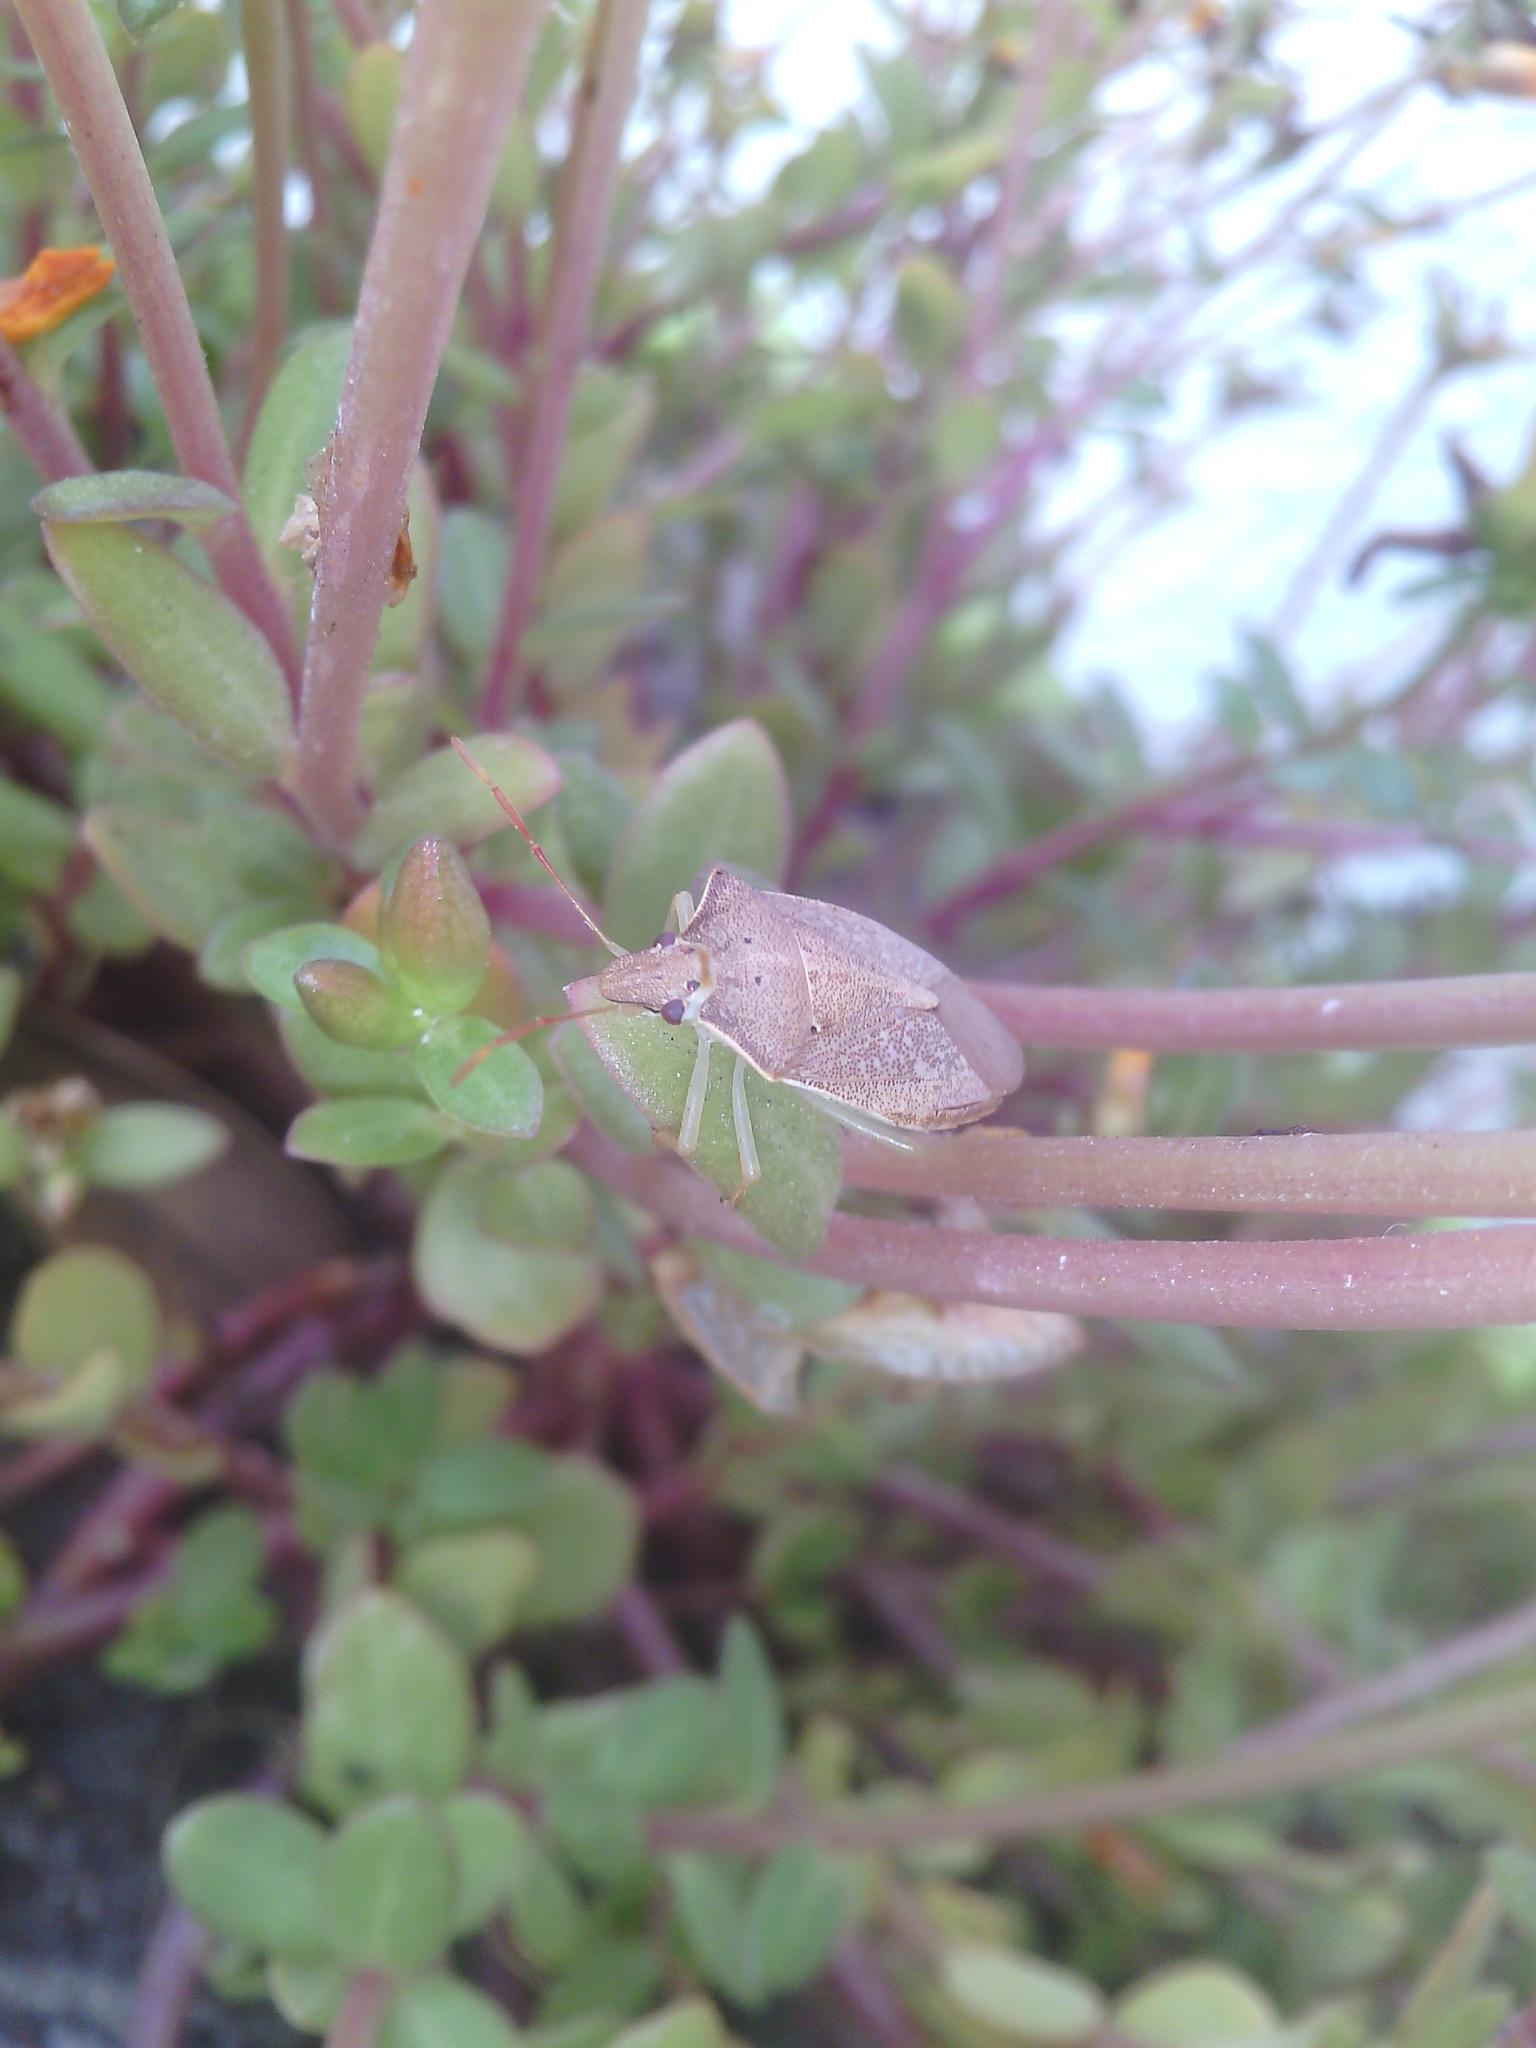 Stink Bug by shantellelottering